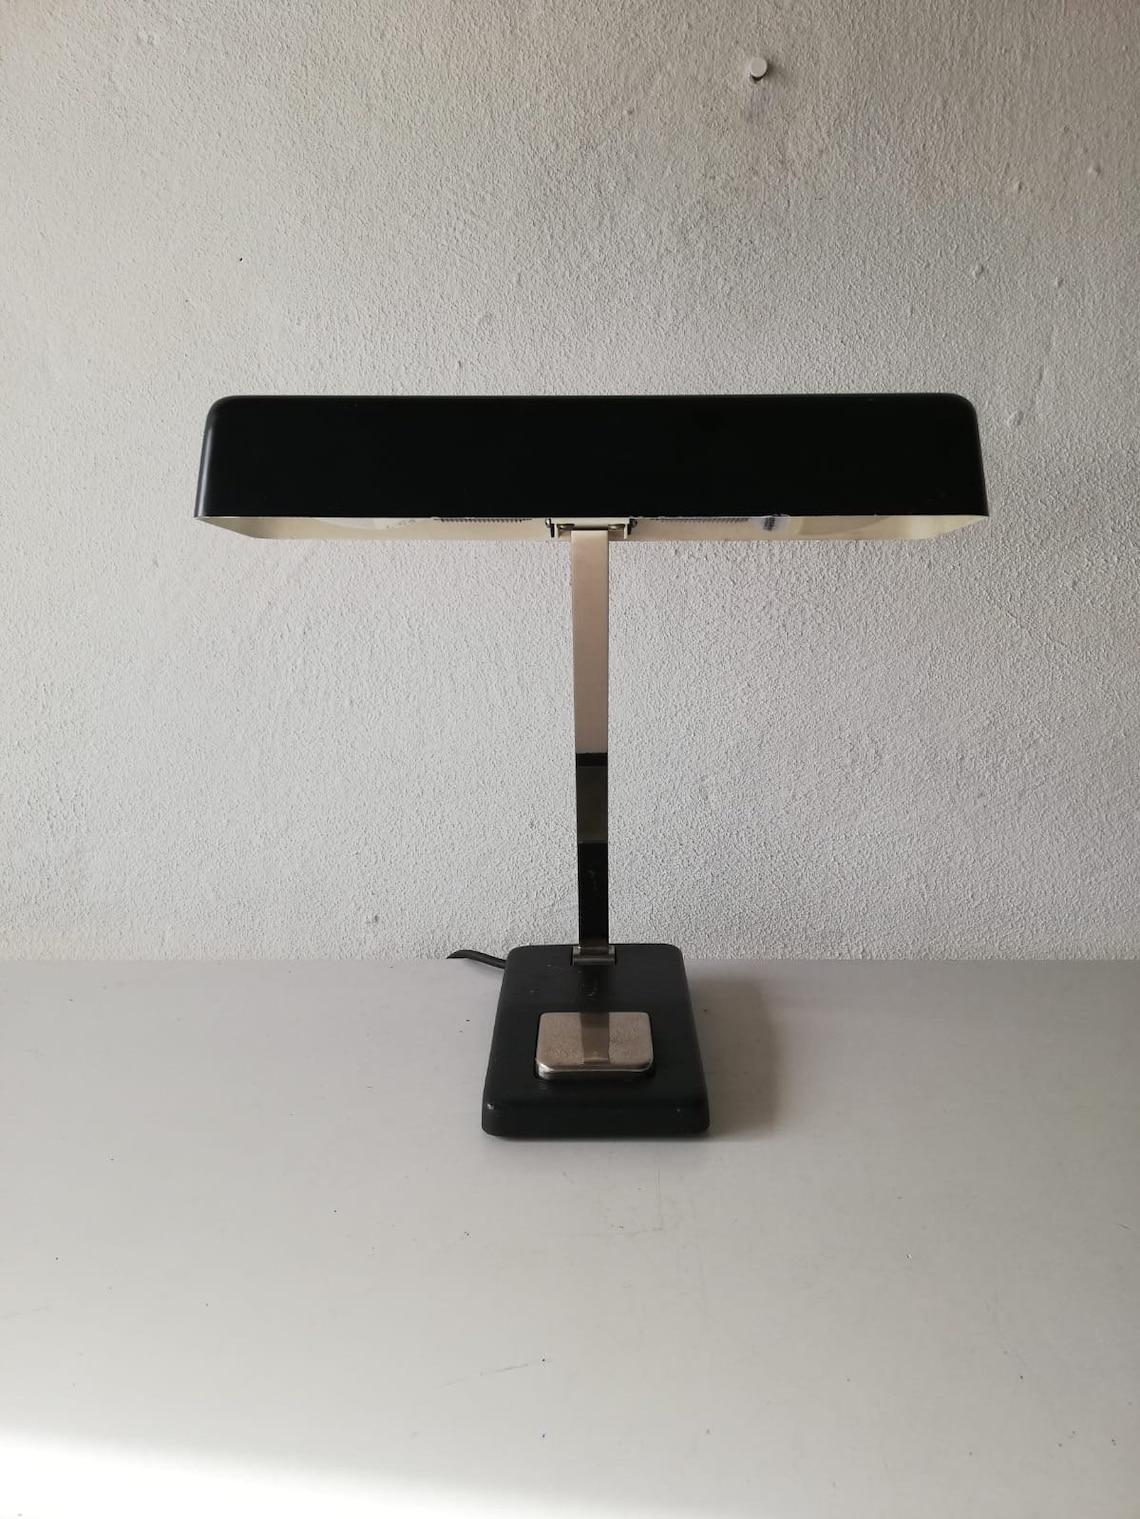 Hillebrand 2 socket black metal Table lamp - 1970s Germany